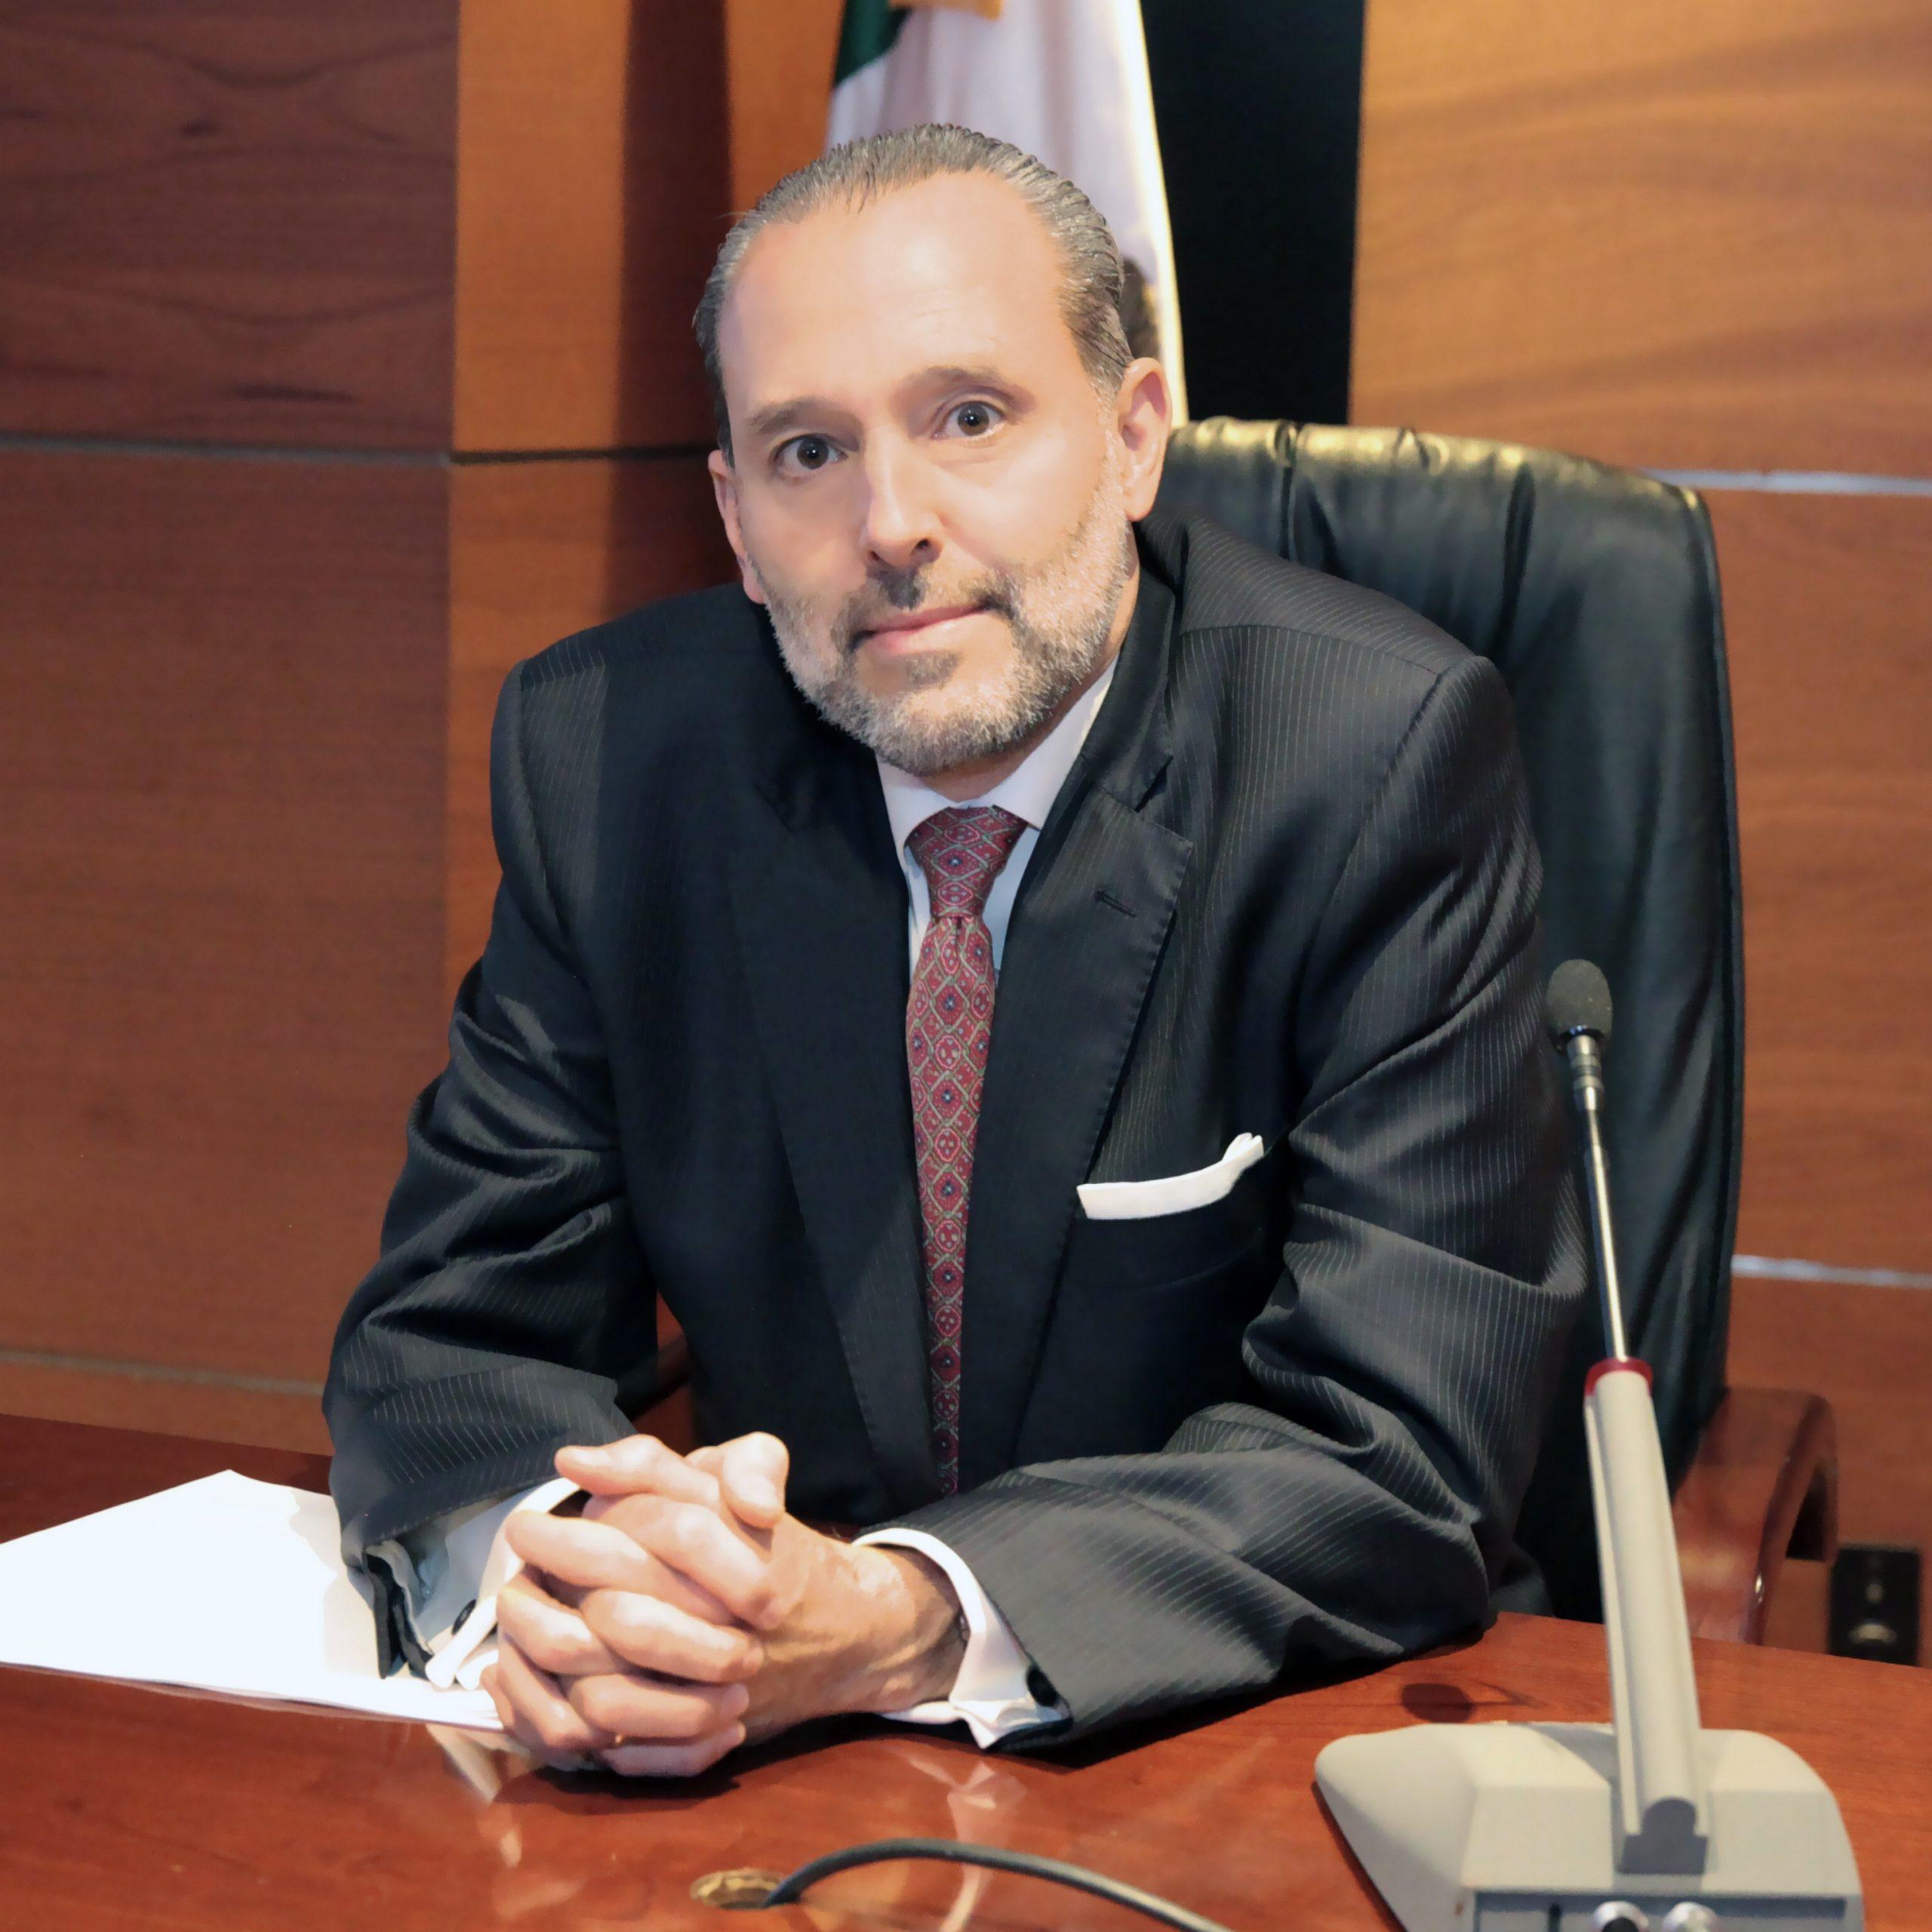 Carlos Espinosa Berecochea